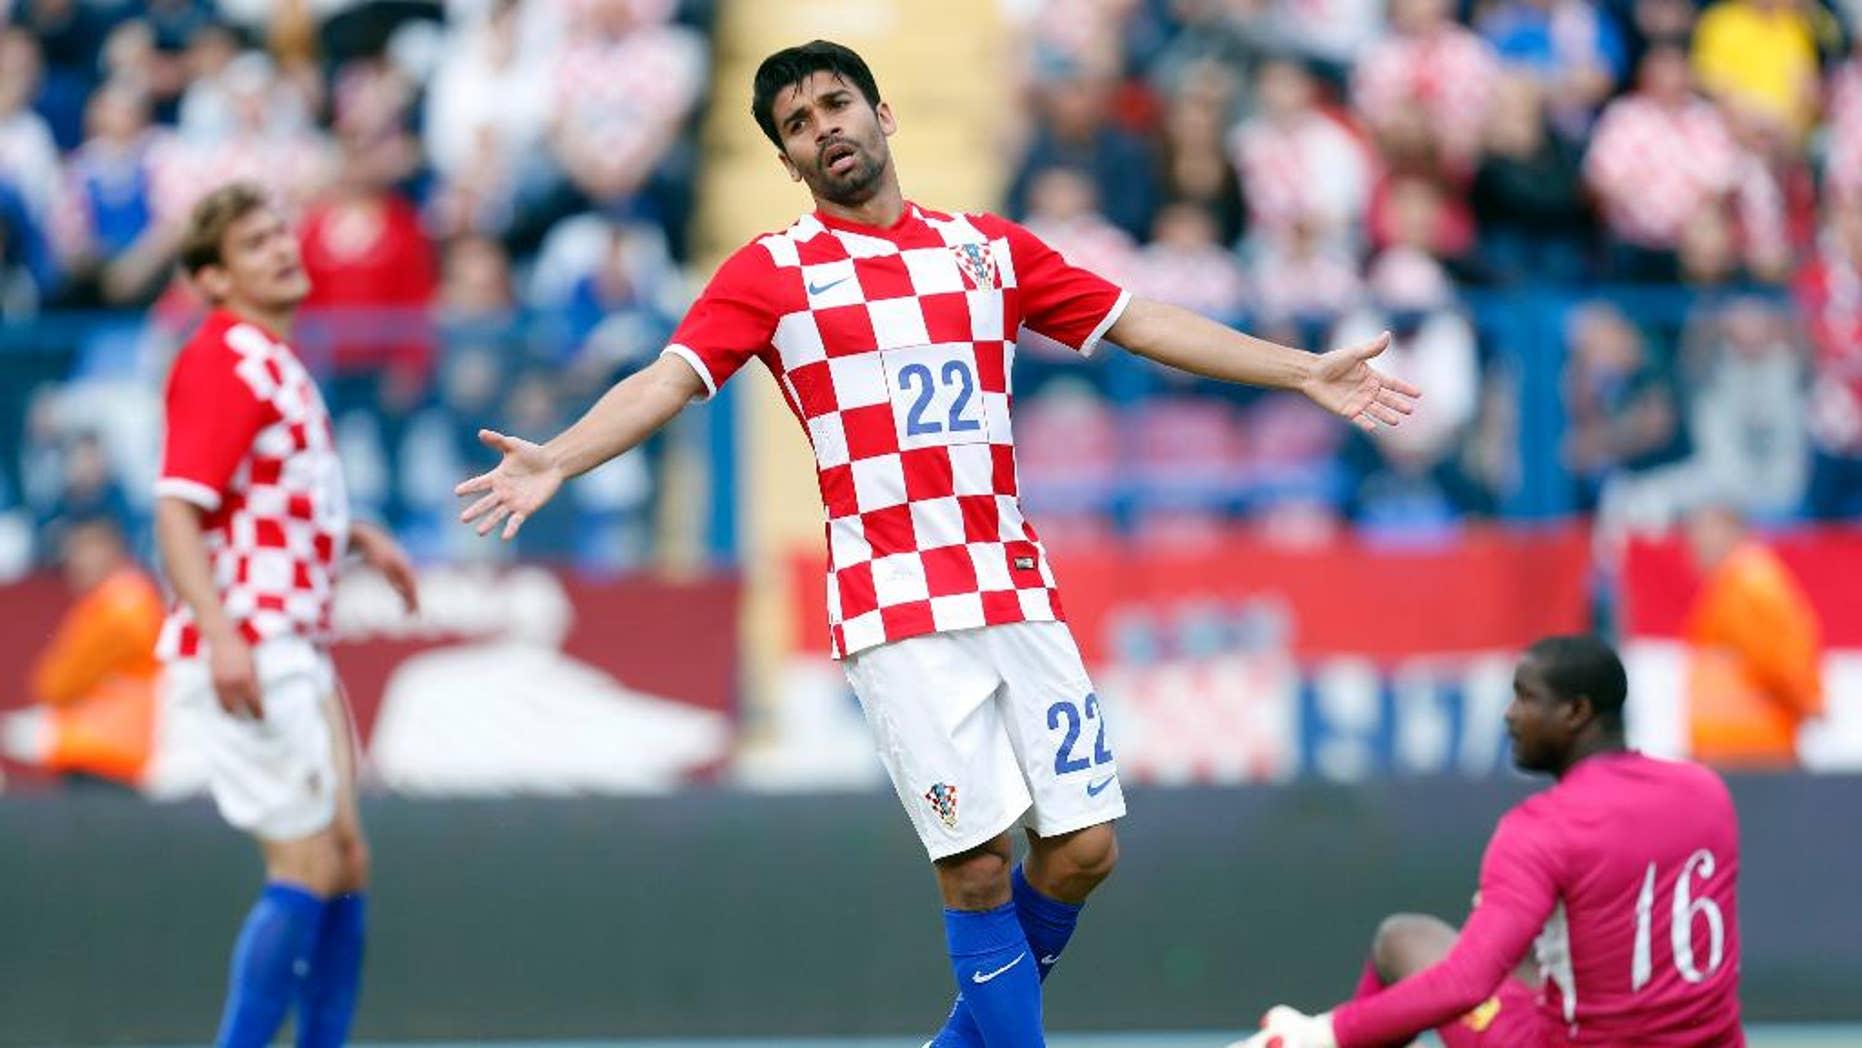 Croatia's Eduardo Da Silva  gestures  during the internationa friendly soccer match between Croatia and Mali, in Osijek, Croatia, Saturday, May 31, 2014. (AP Photo/Darko Bandic)